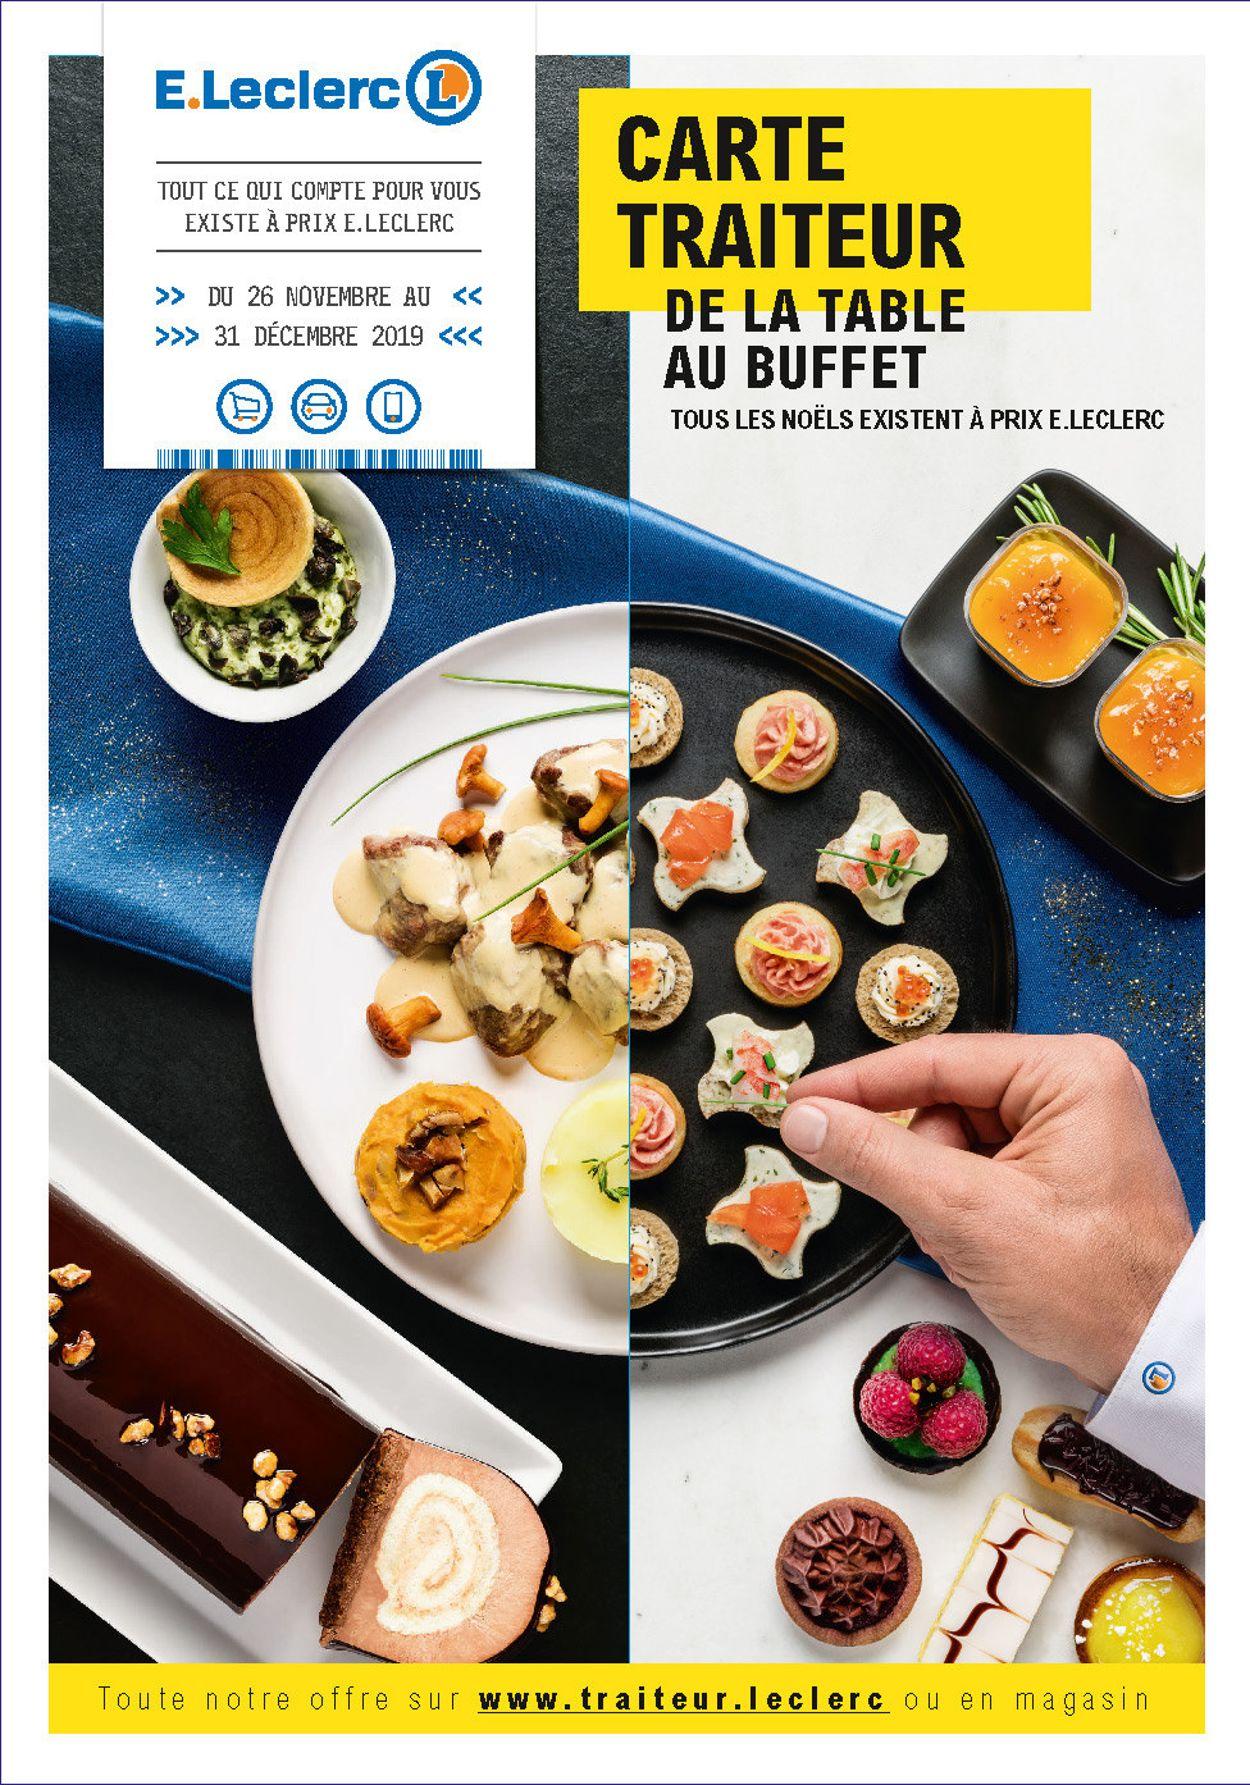 E.leclerc catalogue de Noël 2019 Catalogue - 30.11-31.12.2019